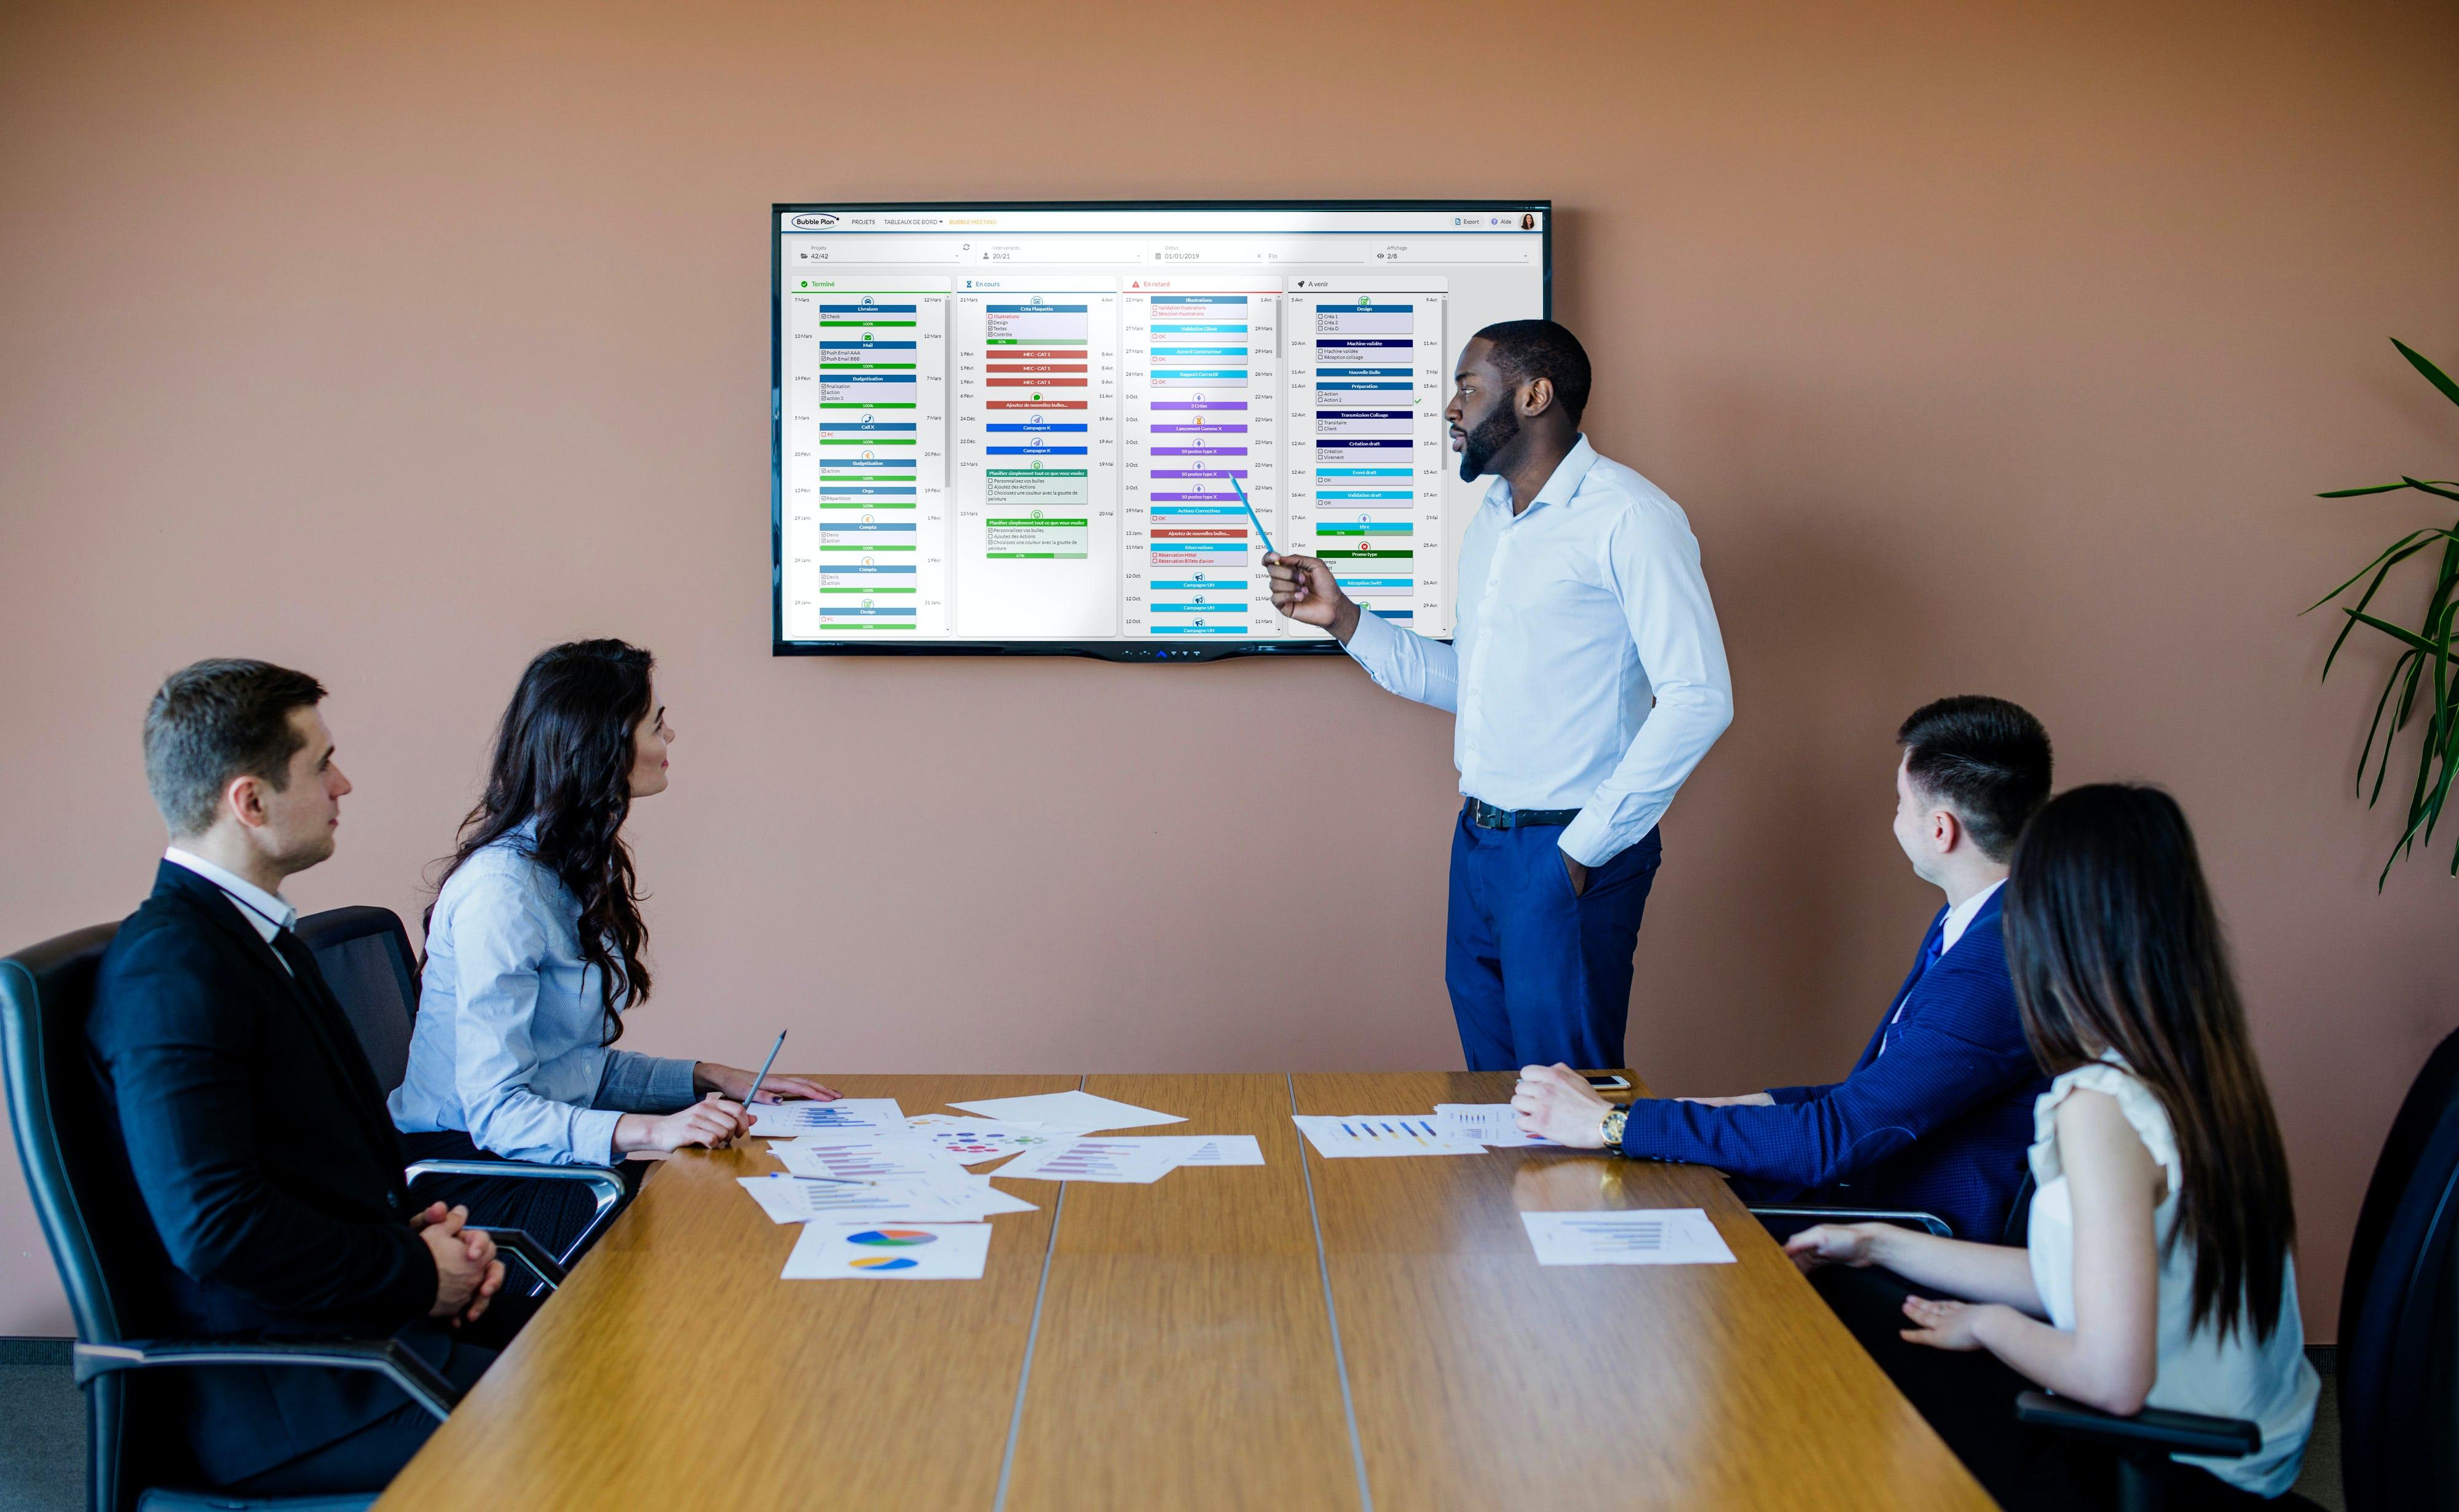 Dashboard in meeting